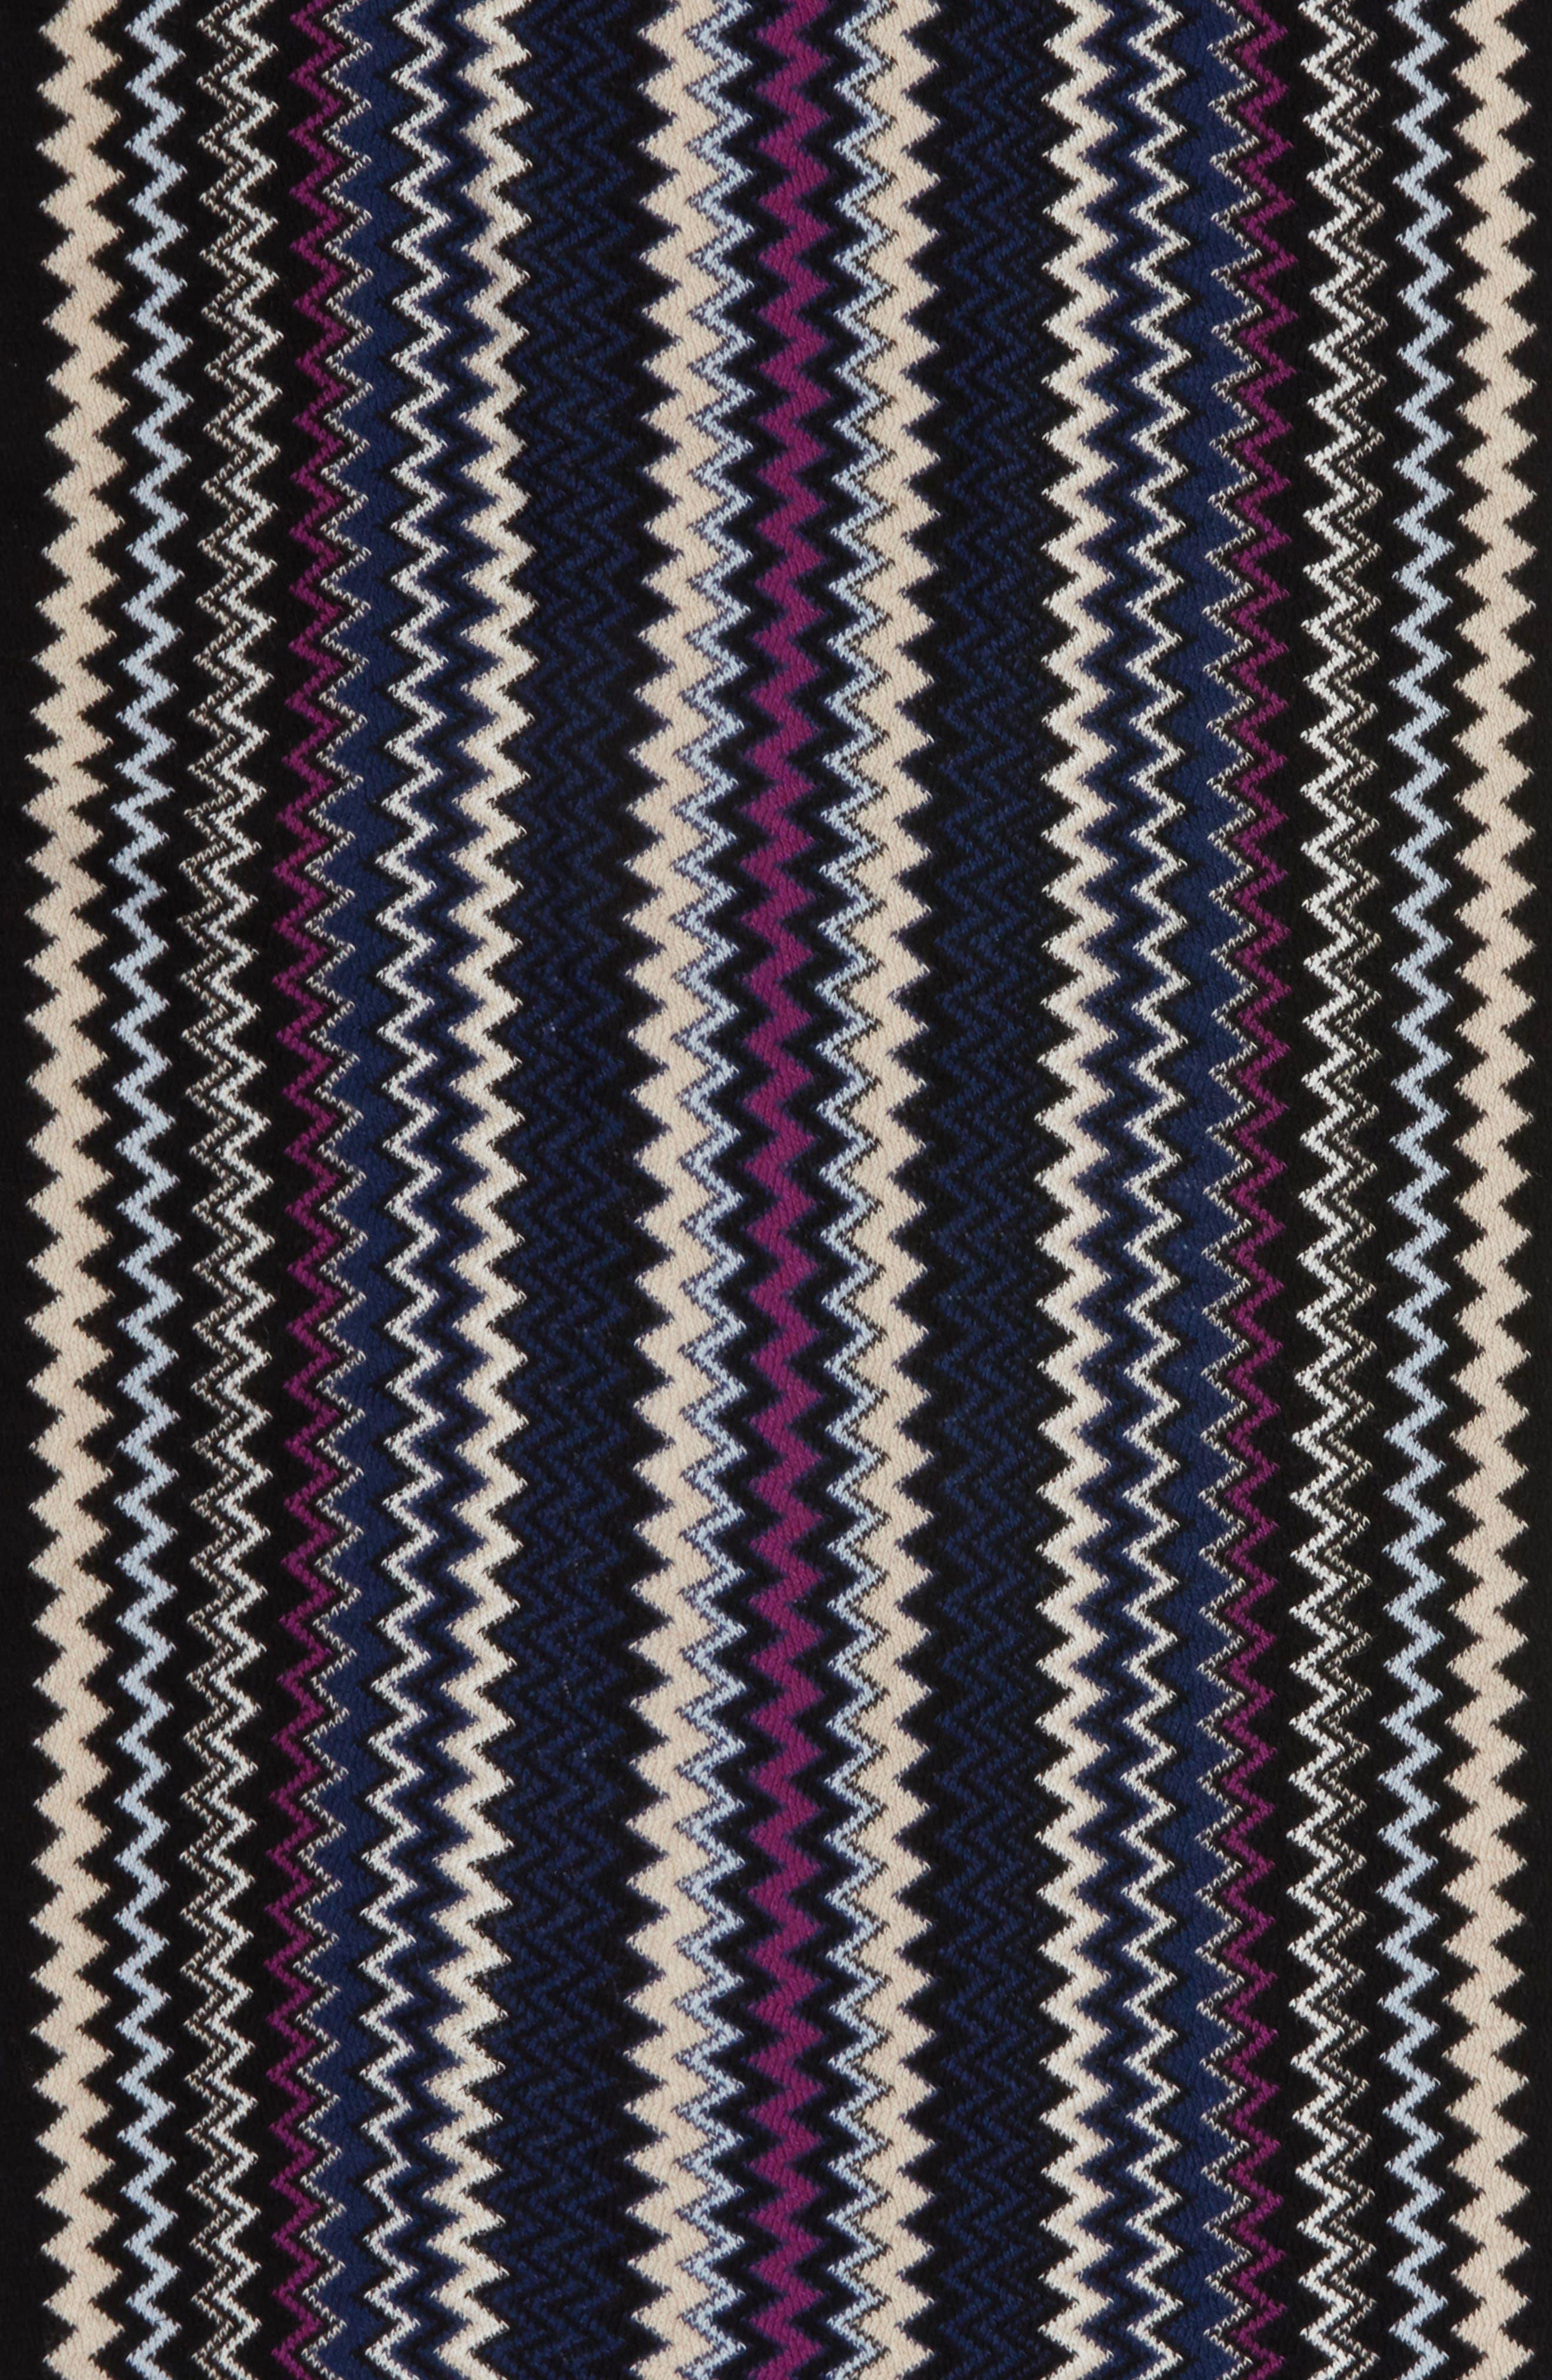 Zigzag Fringe Cashmere Scarf,                             Alternate thumbnail 4, color,                             Navy / Black